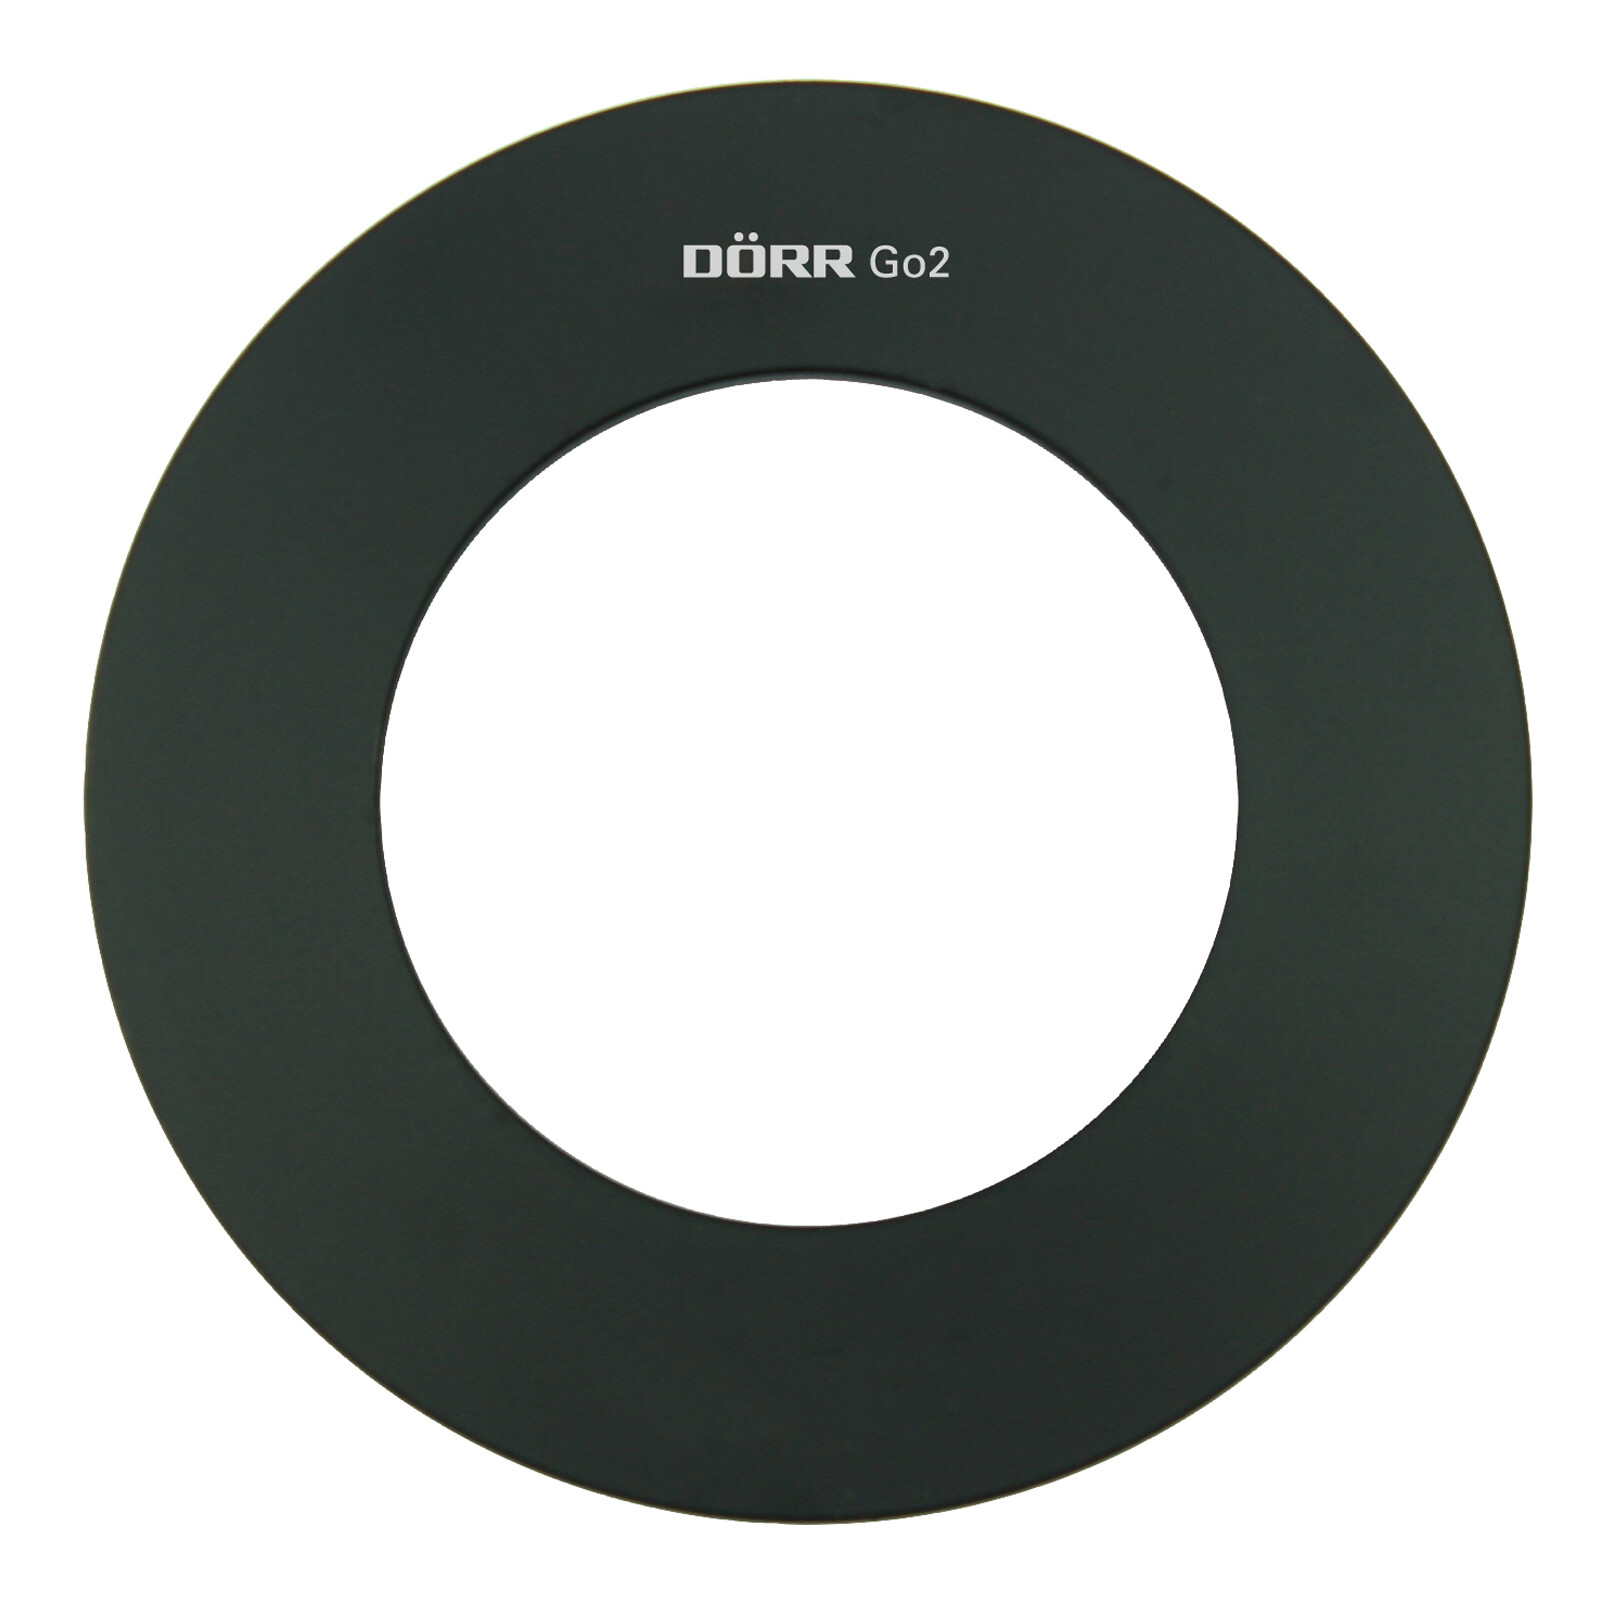 Dörr Go2 Metall Anschlussring 40,5mm